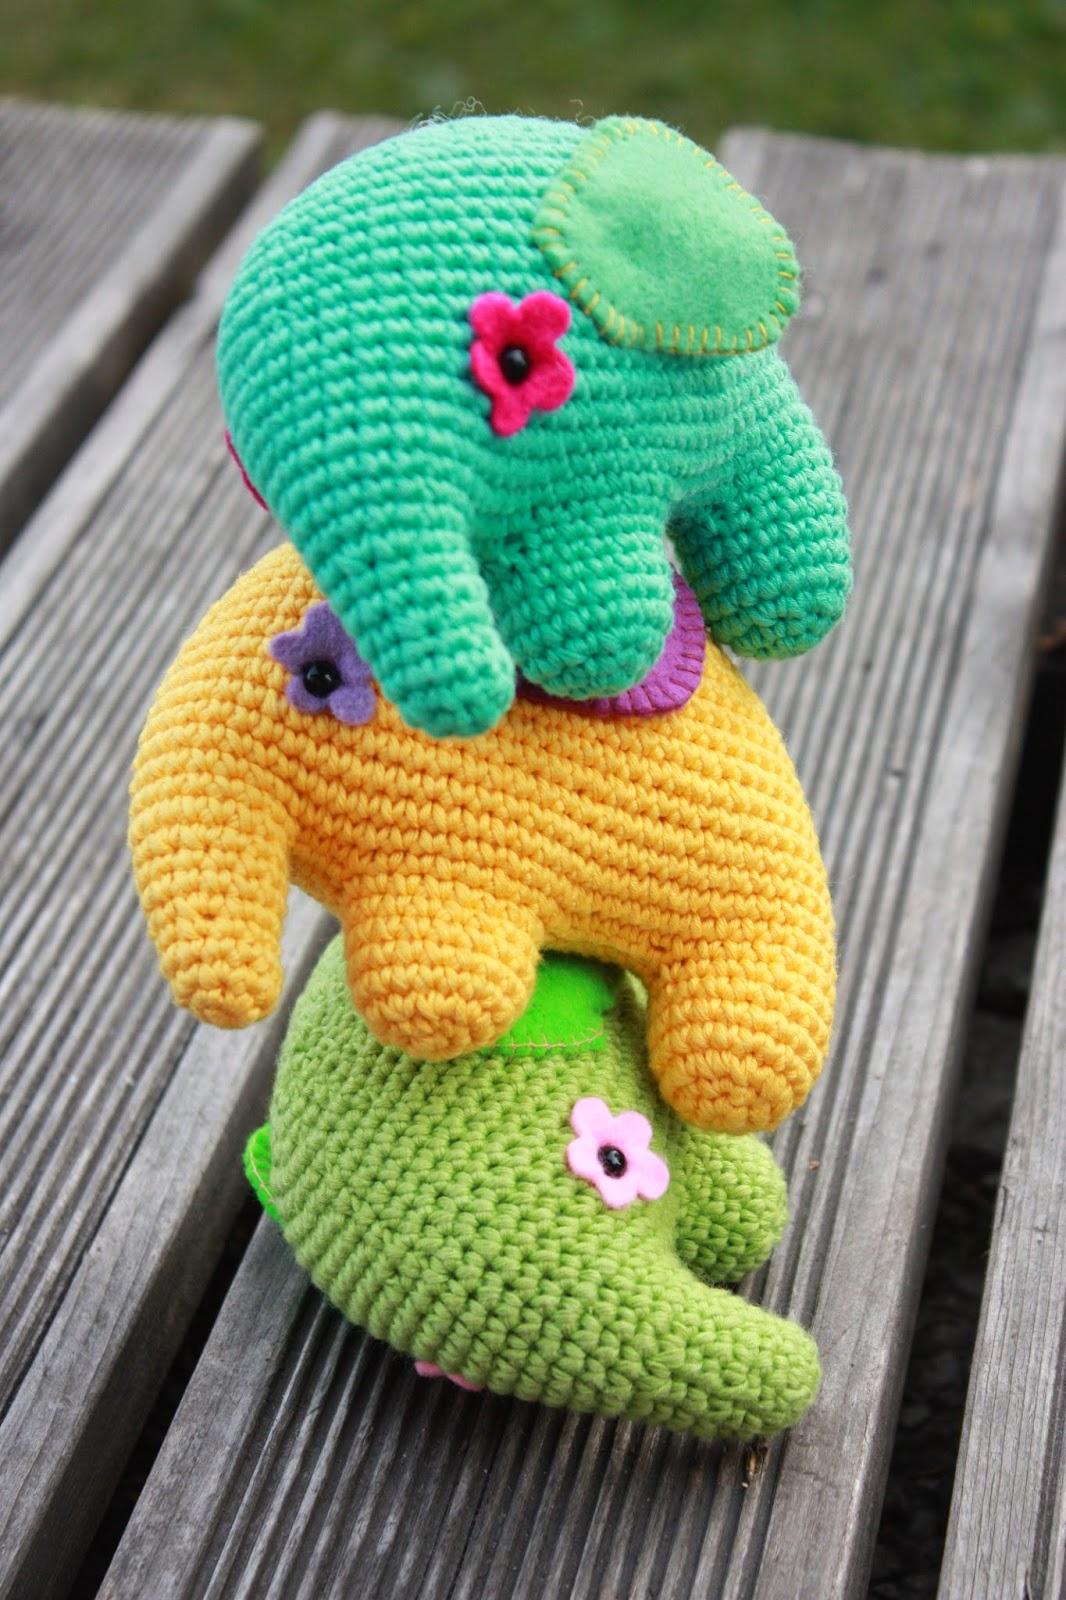 Crochet Floor Lounge Elephant Pillow Pattern | The Crochet Crowd | 1600x1066